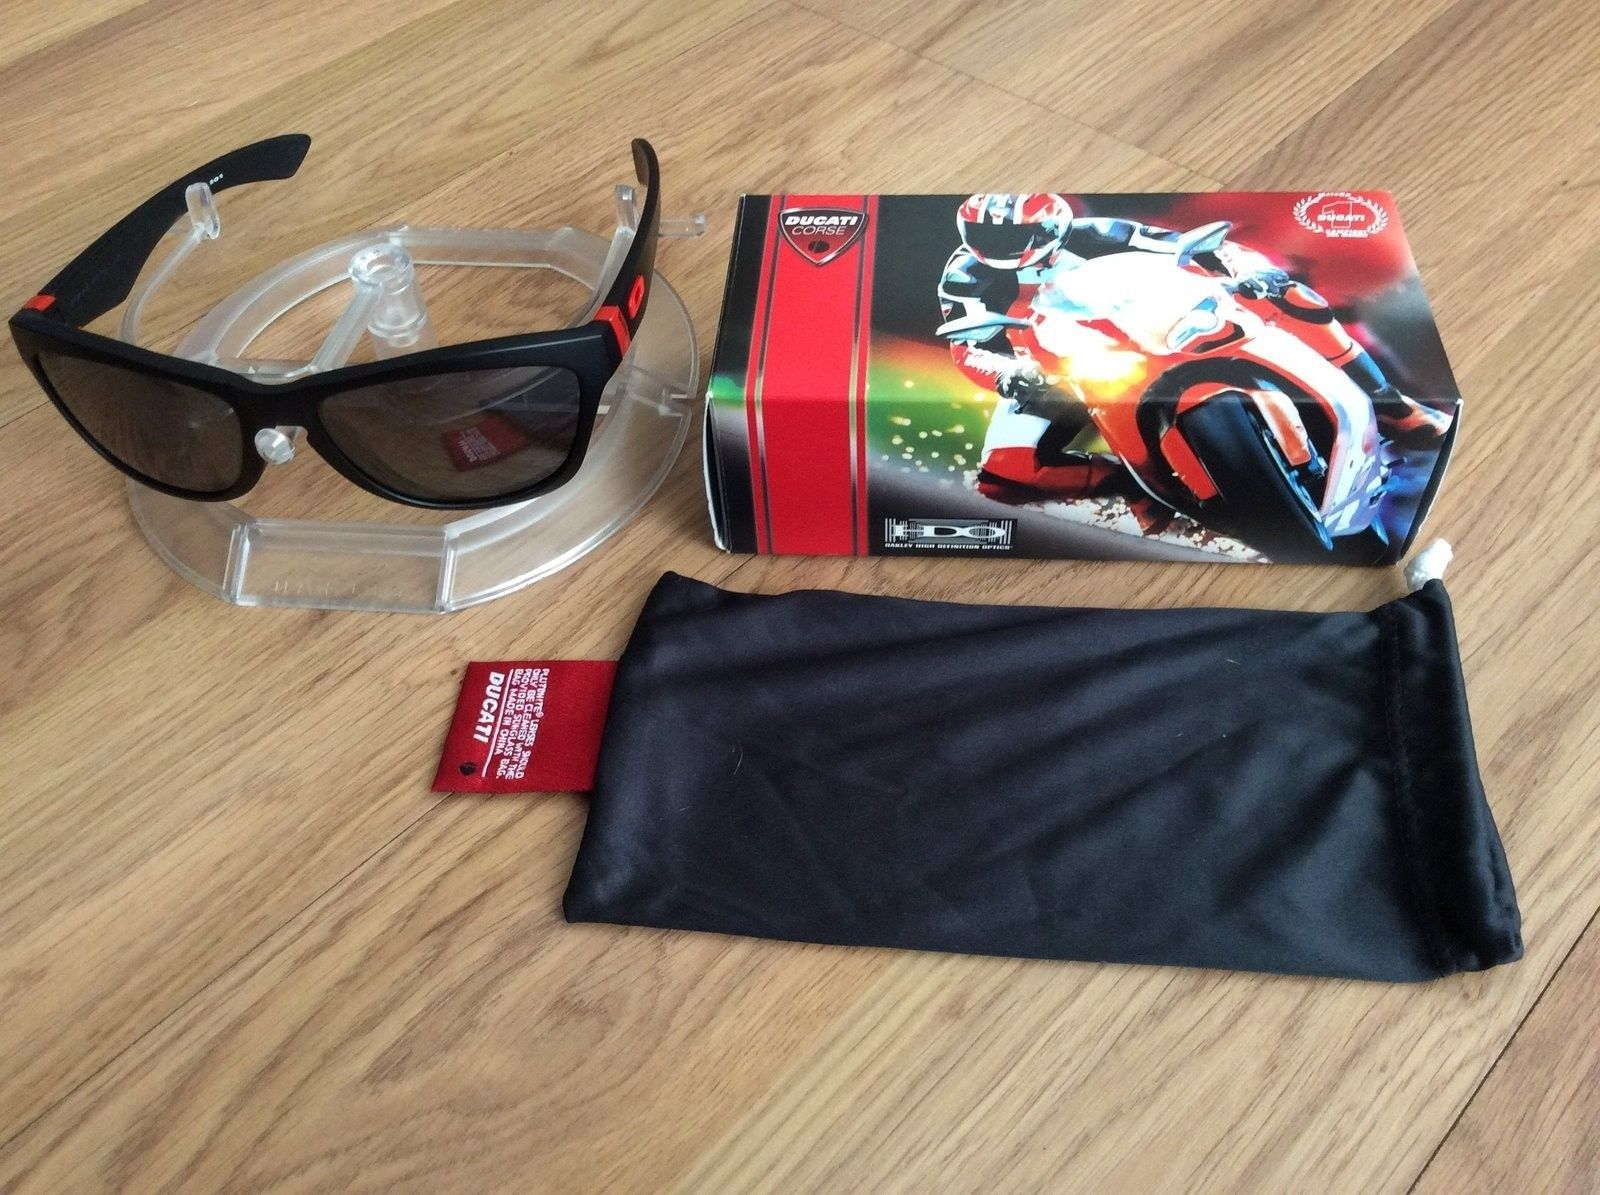 BNIB Ducati Jupiter $100 shipped - image.jpg